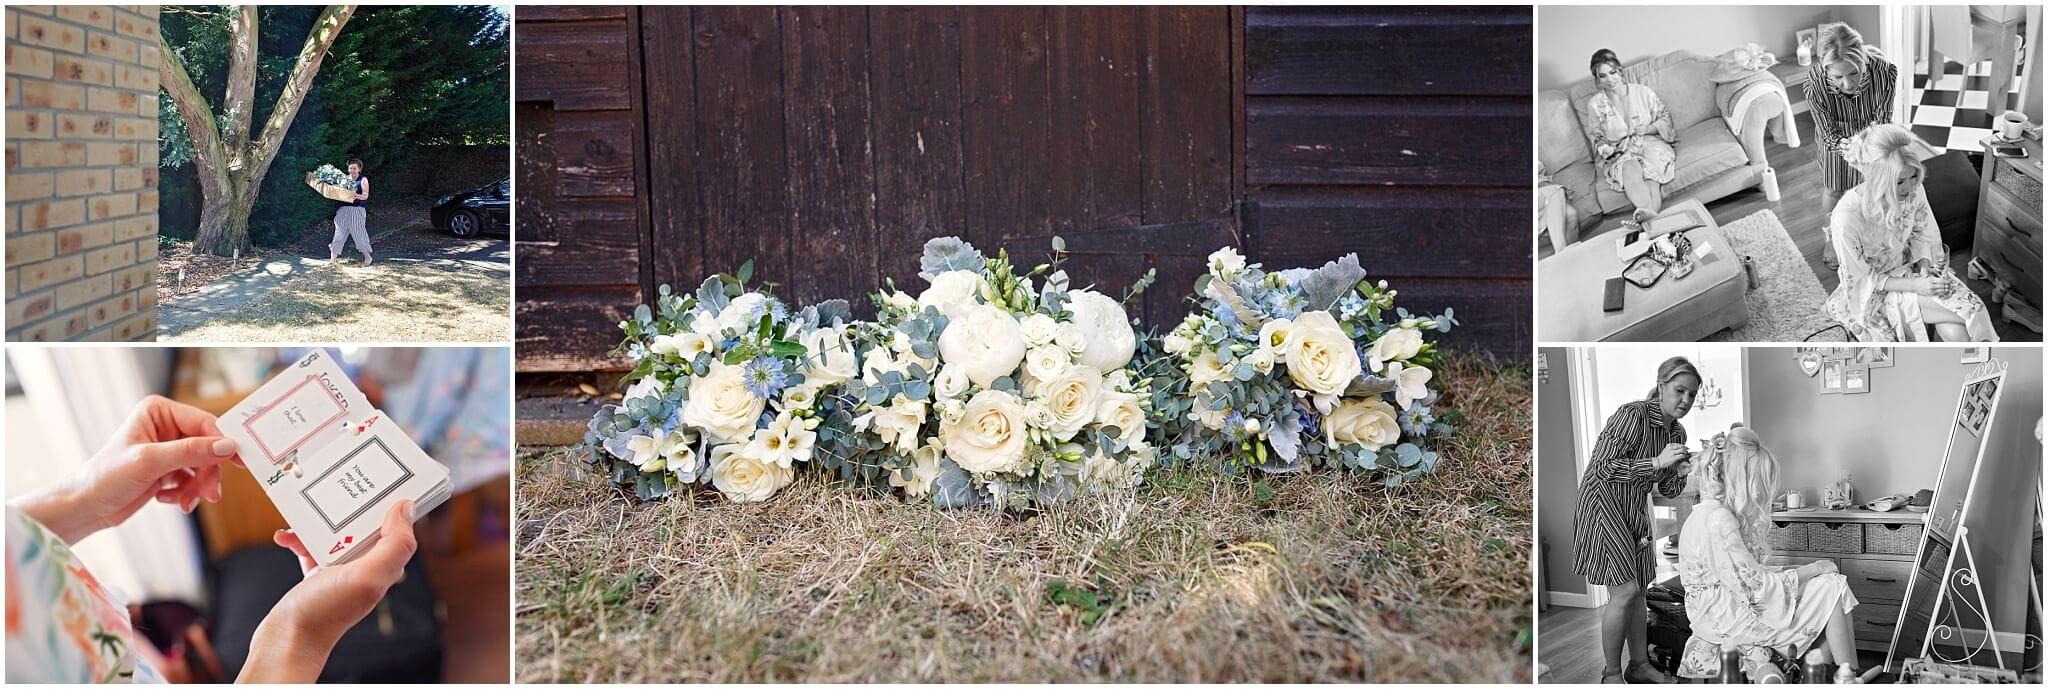 Jo Malone Wedding Scent, Rachel Simpson wedding shoes